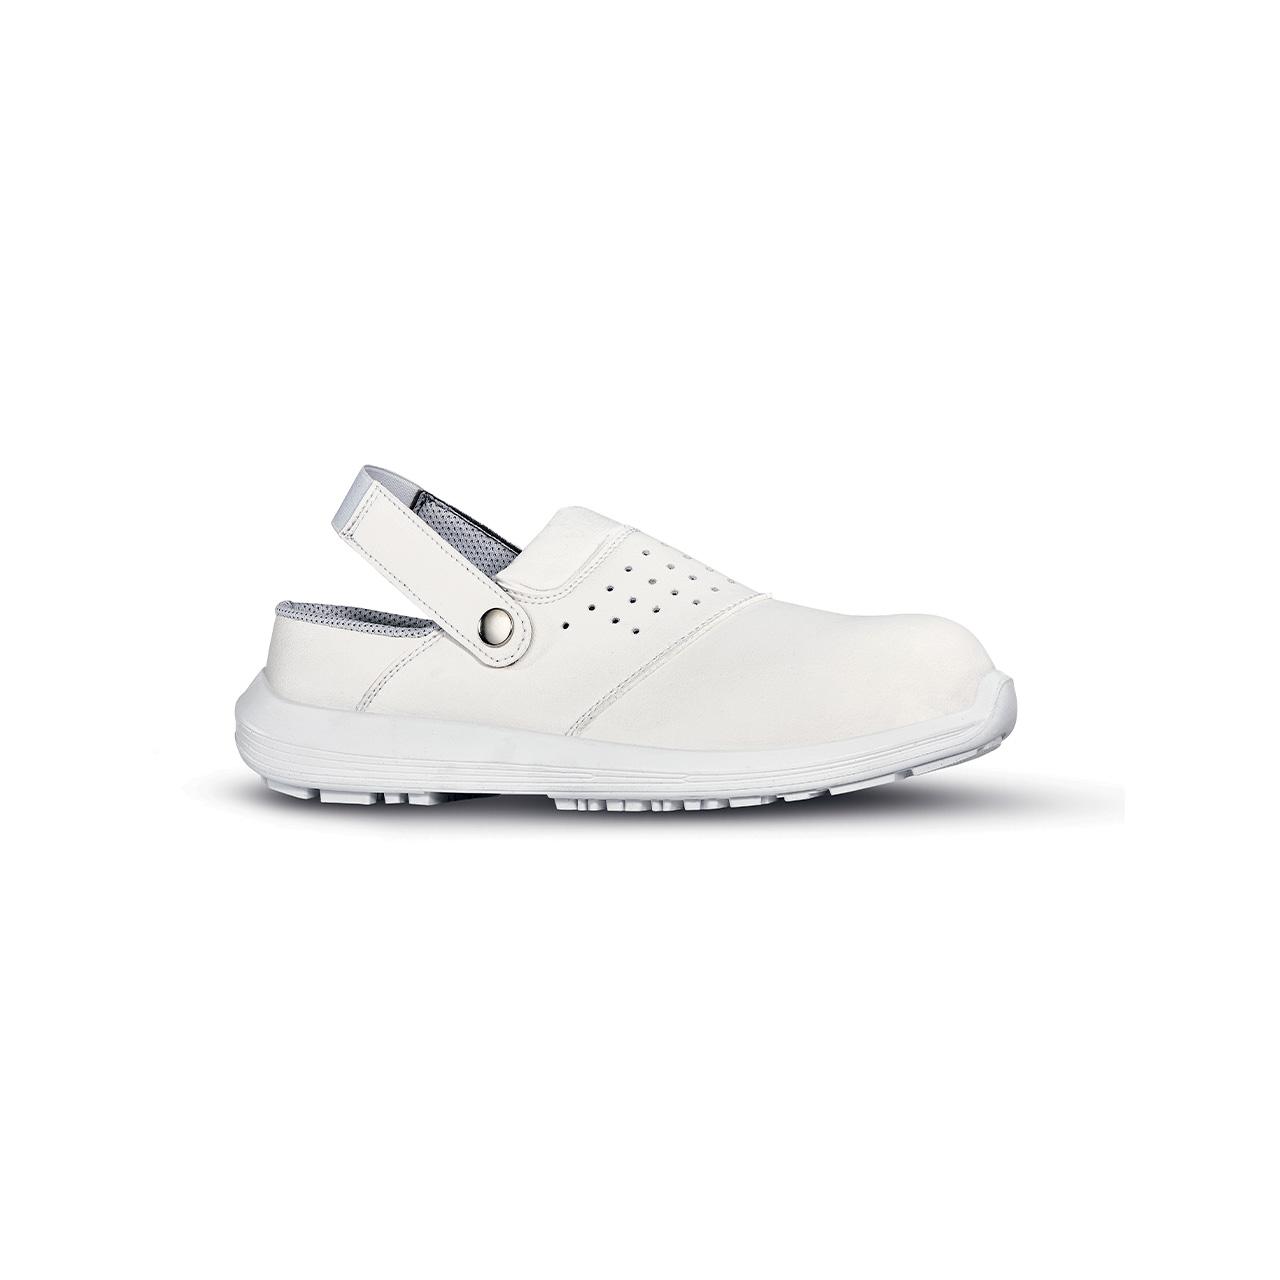 scarpa antinfortunistica upower modello breeze linea lei_lei vista laterale